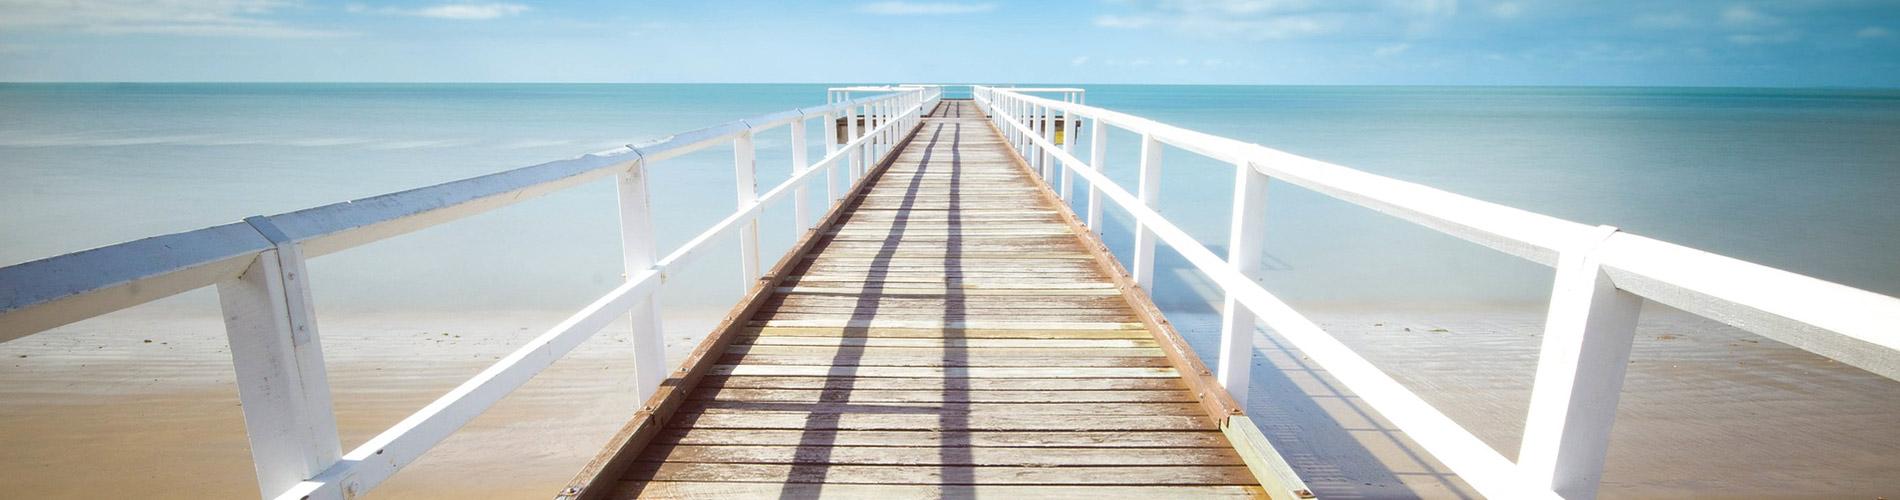 EuGH beschließt: Urlaubsanspruch kann nicht verfallen